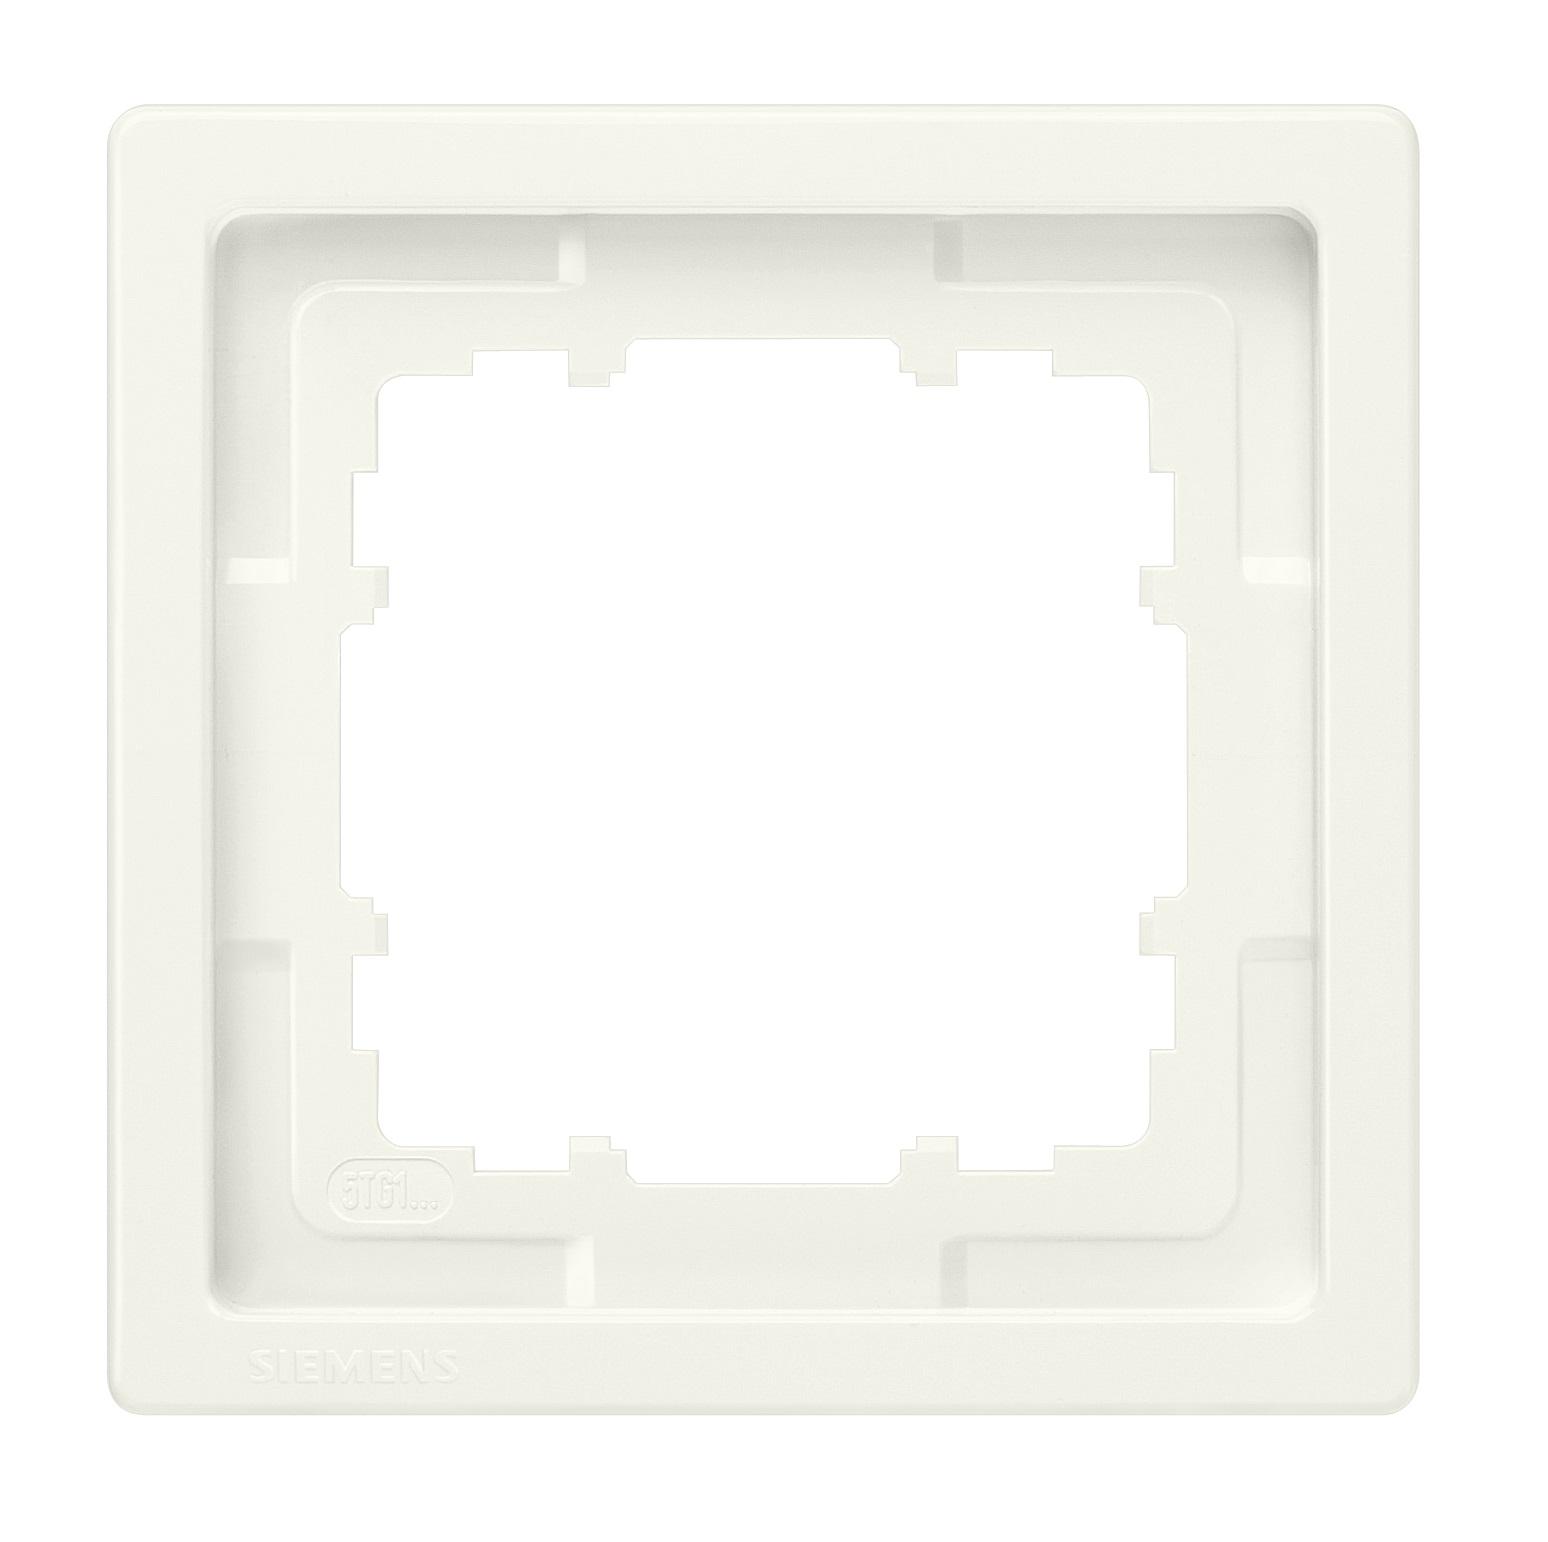 1 Stk Rahmen, Style, titanweiß, 1-fach  KX1321----